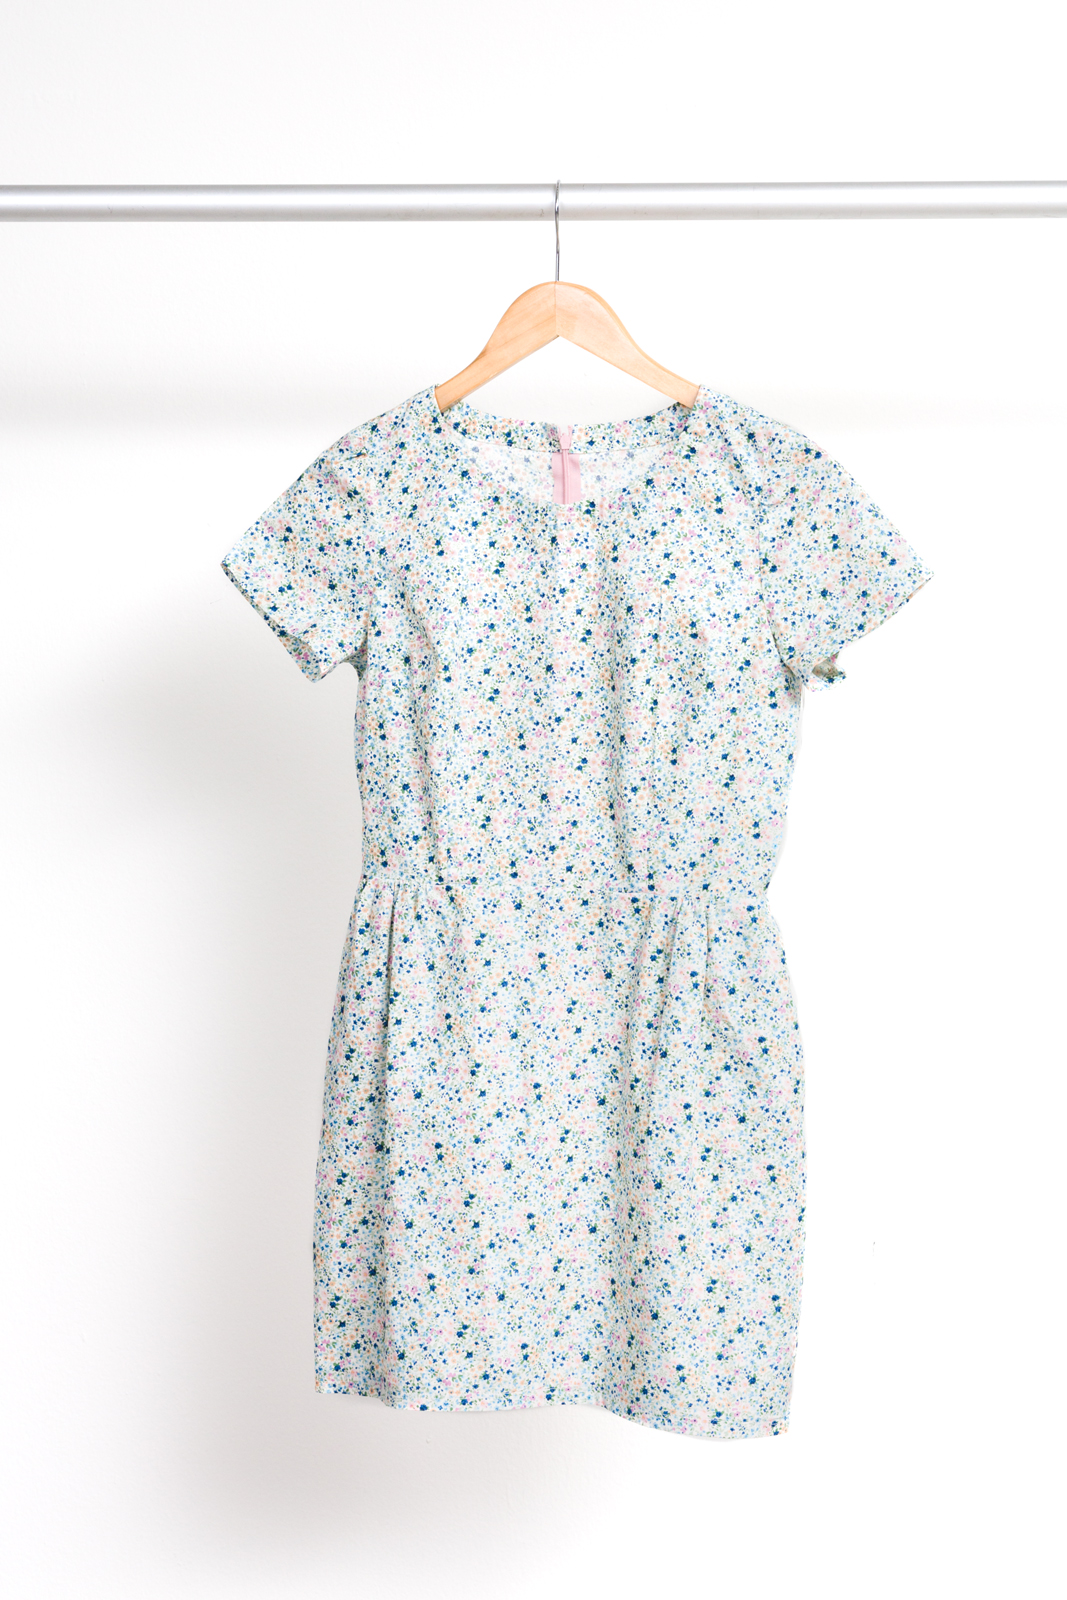 SIGMA DRESS  BY  PAPERCUT PATTERNS ,  SEVENBERRY: PETITE GARDEN